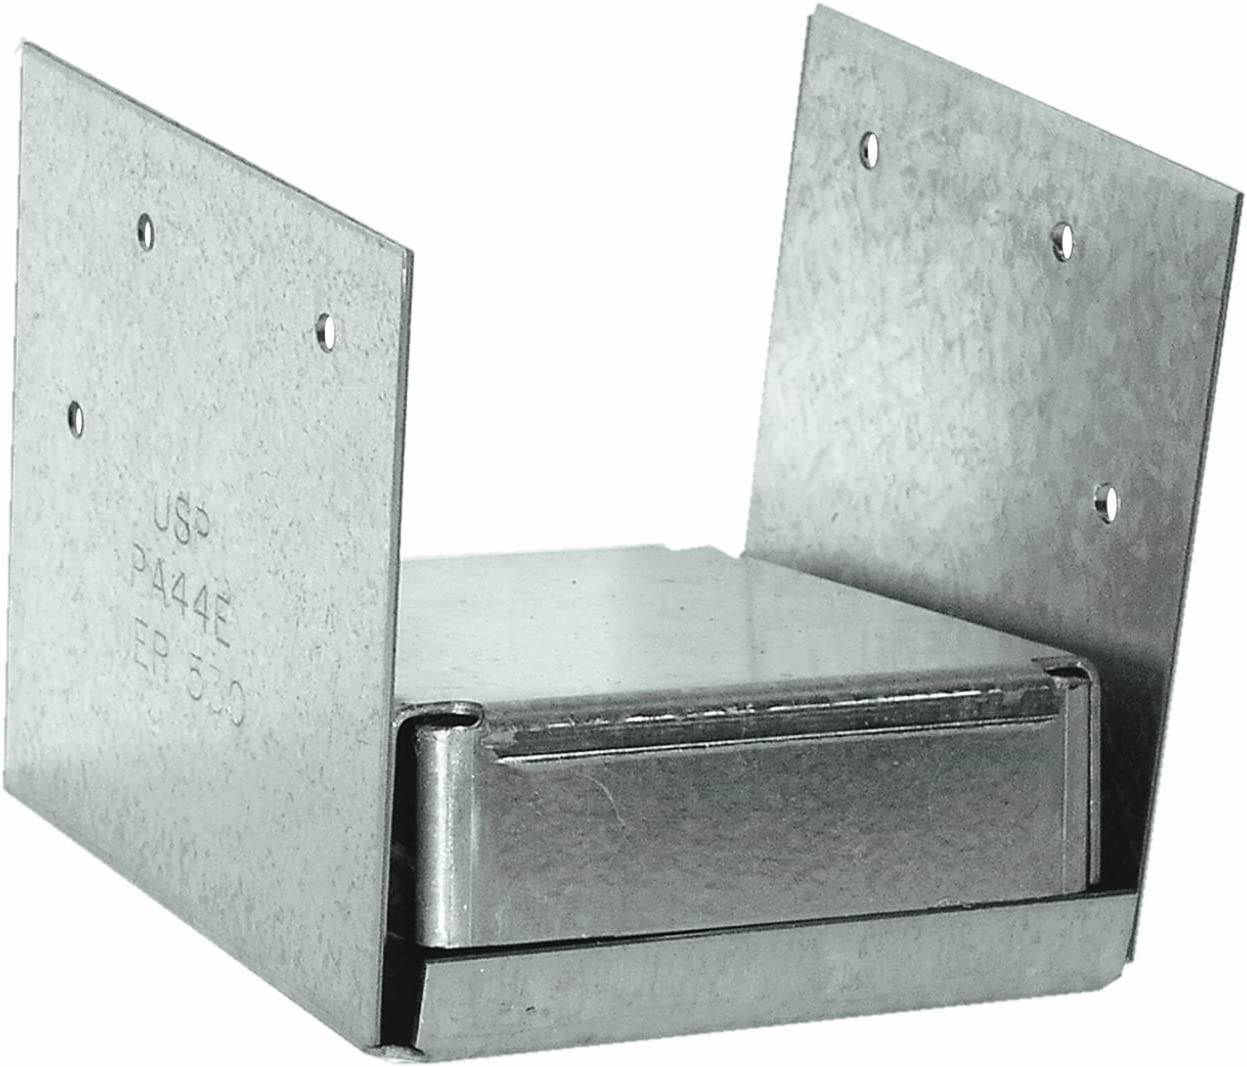 10 Z-Max Adj Post Base - 4 x 4 Post Size Simpson Strong-Tie® ABE44Z 16 Ga